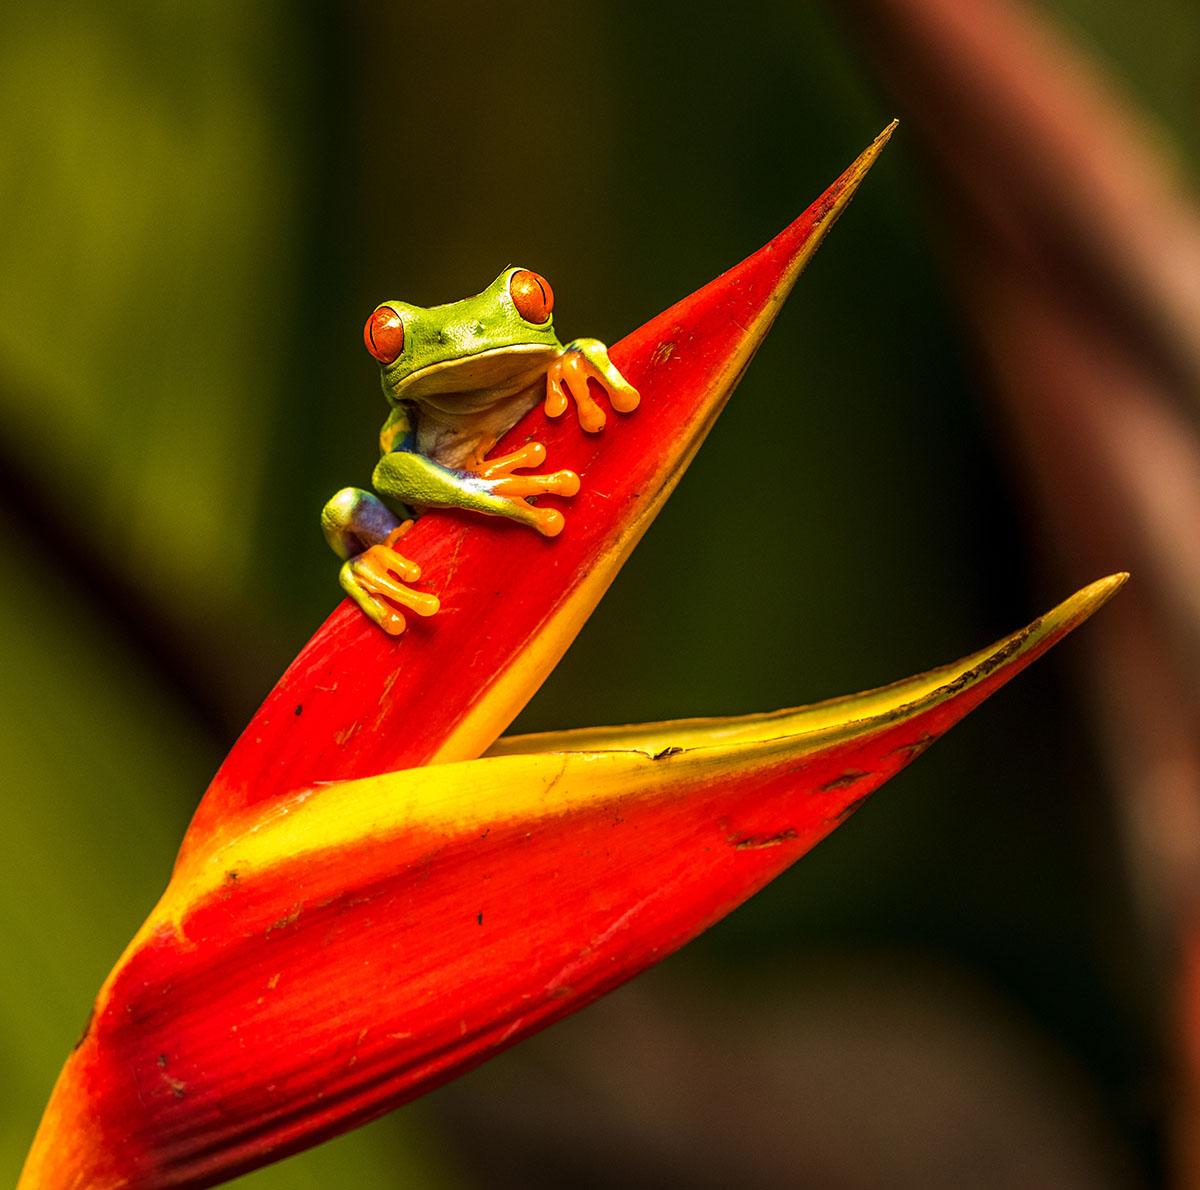 Wildlife in Costa Rica. Photo Credit: Zdeněk Macháček